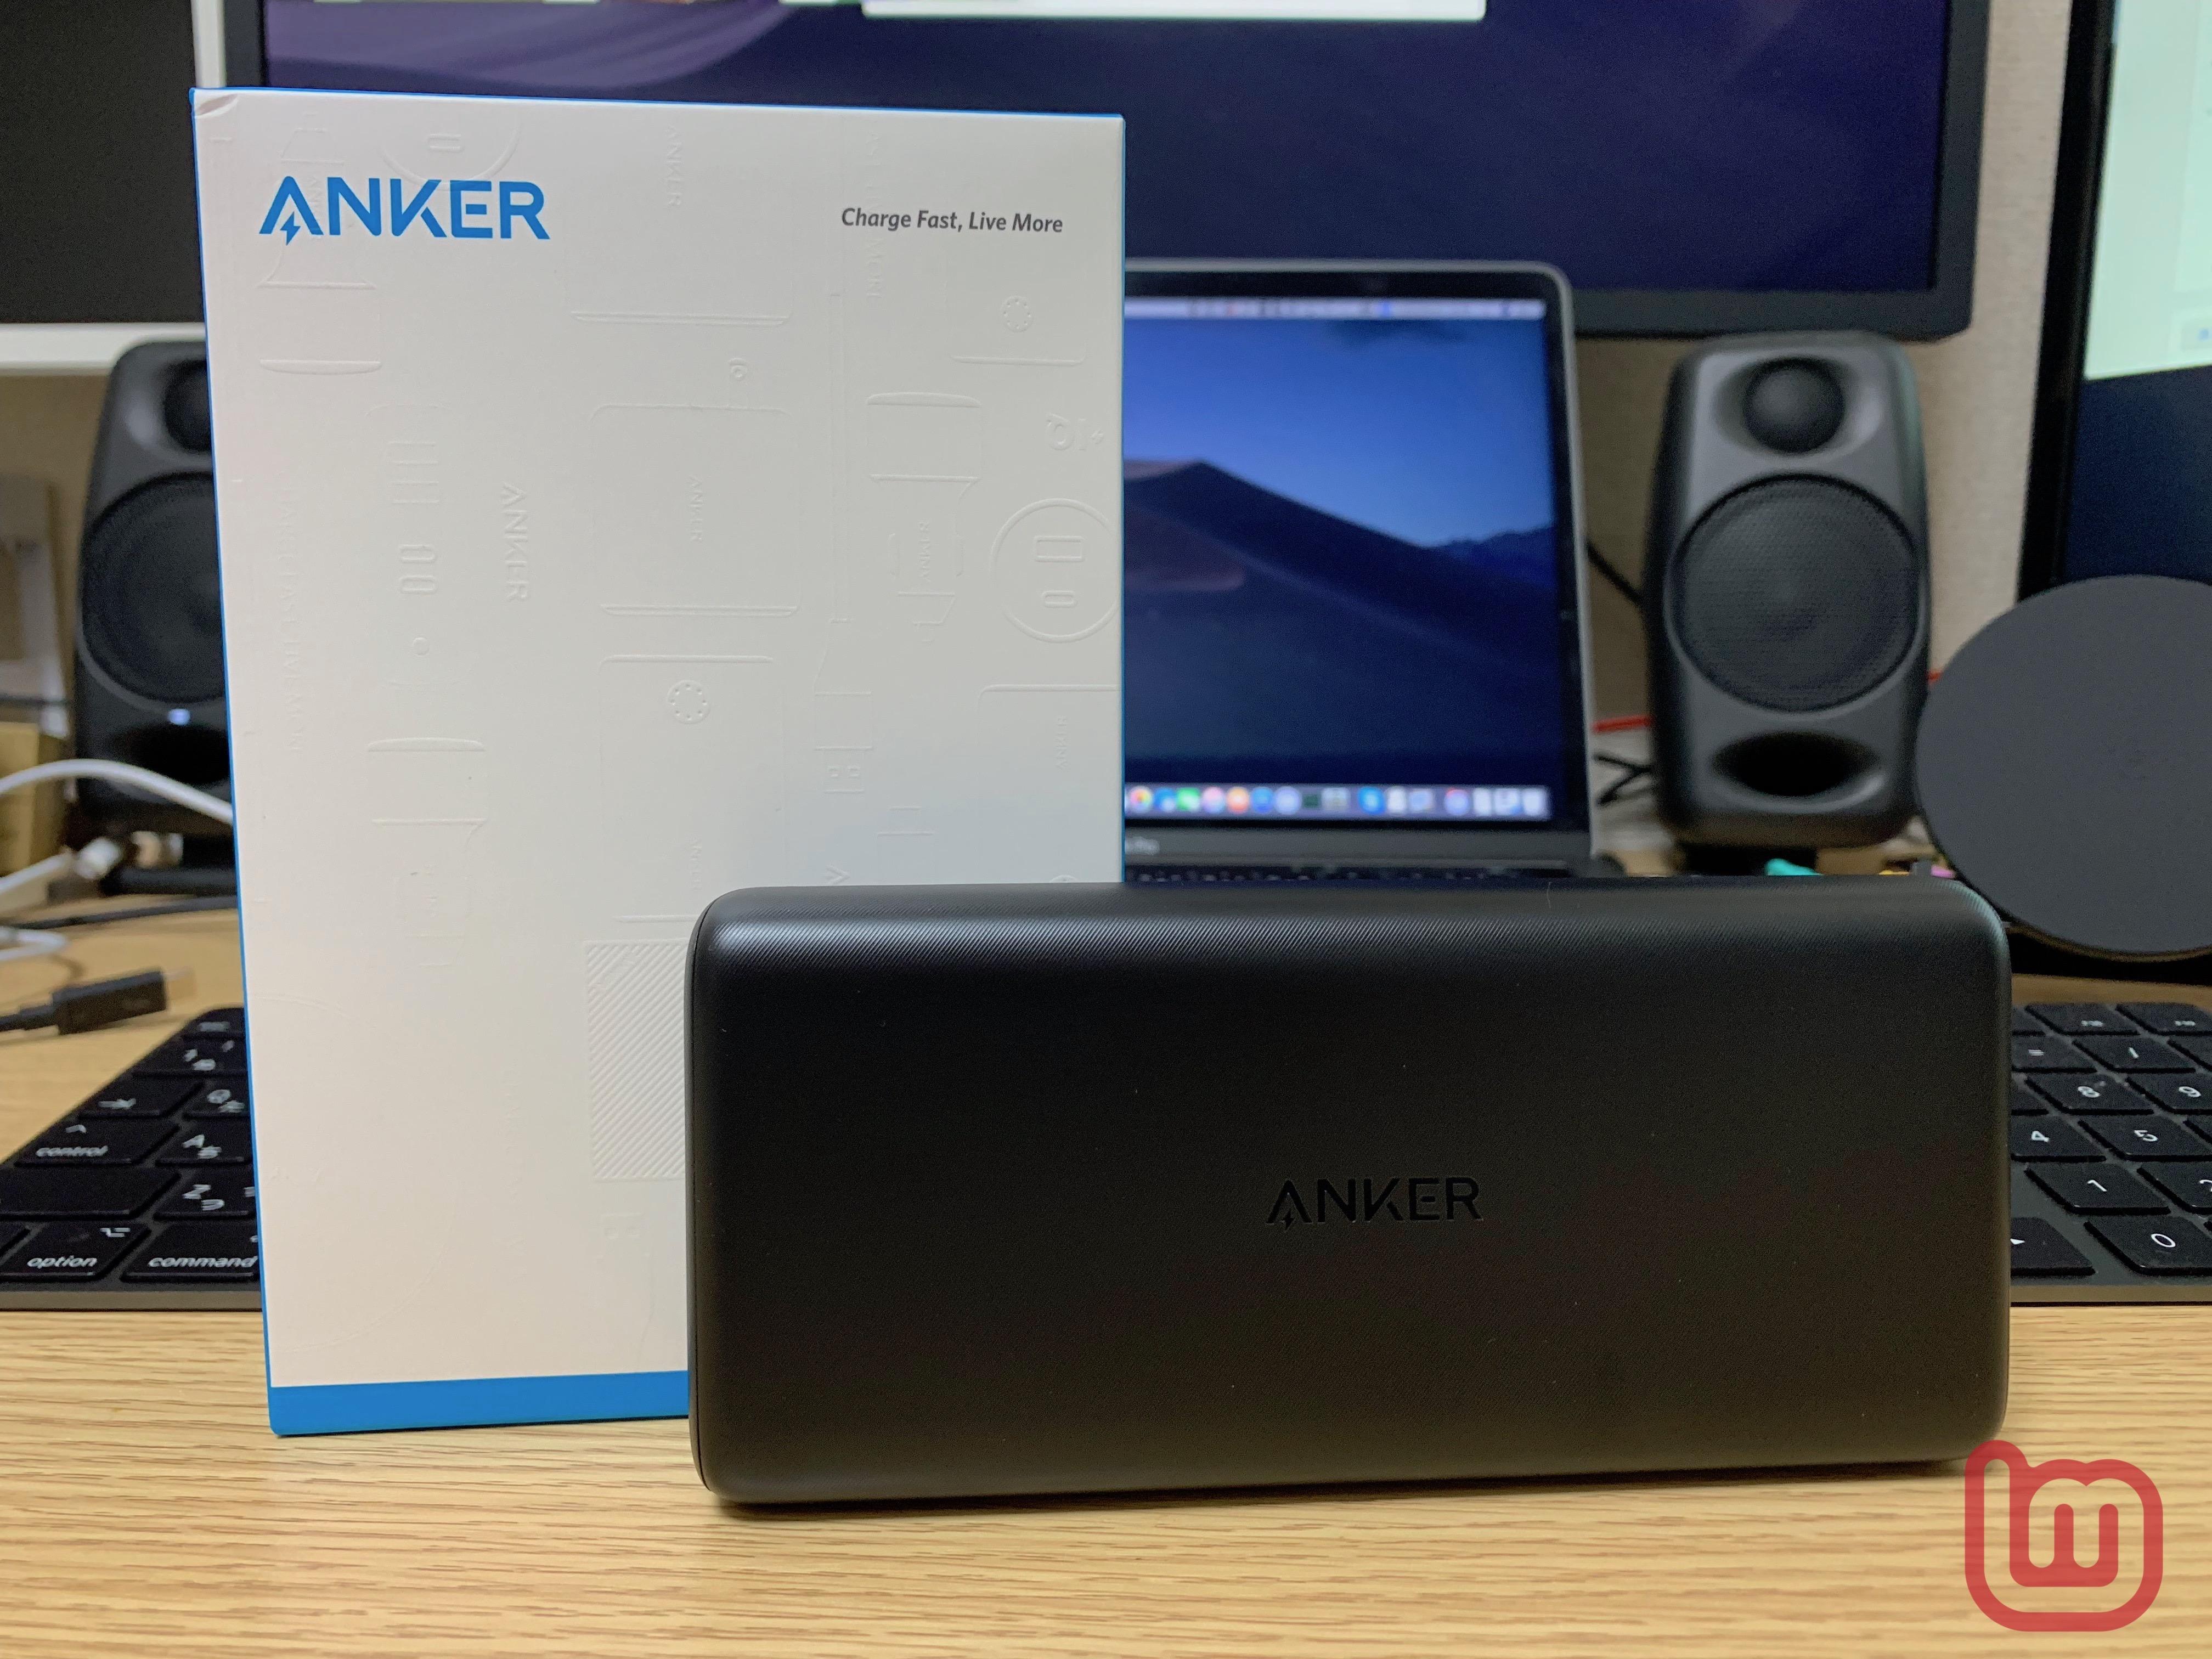 Anekr、薄型の超大容量モバイルバッテリー「Anker PowerCore Lite 20000」の販売を開始 ー 初回500個限定で500円オフ!